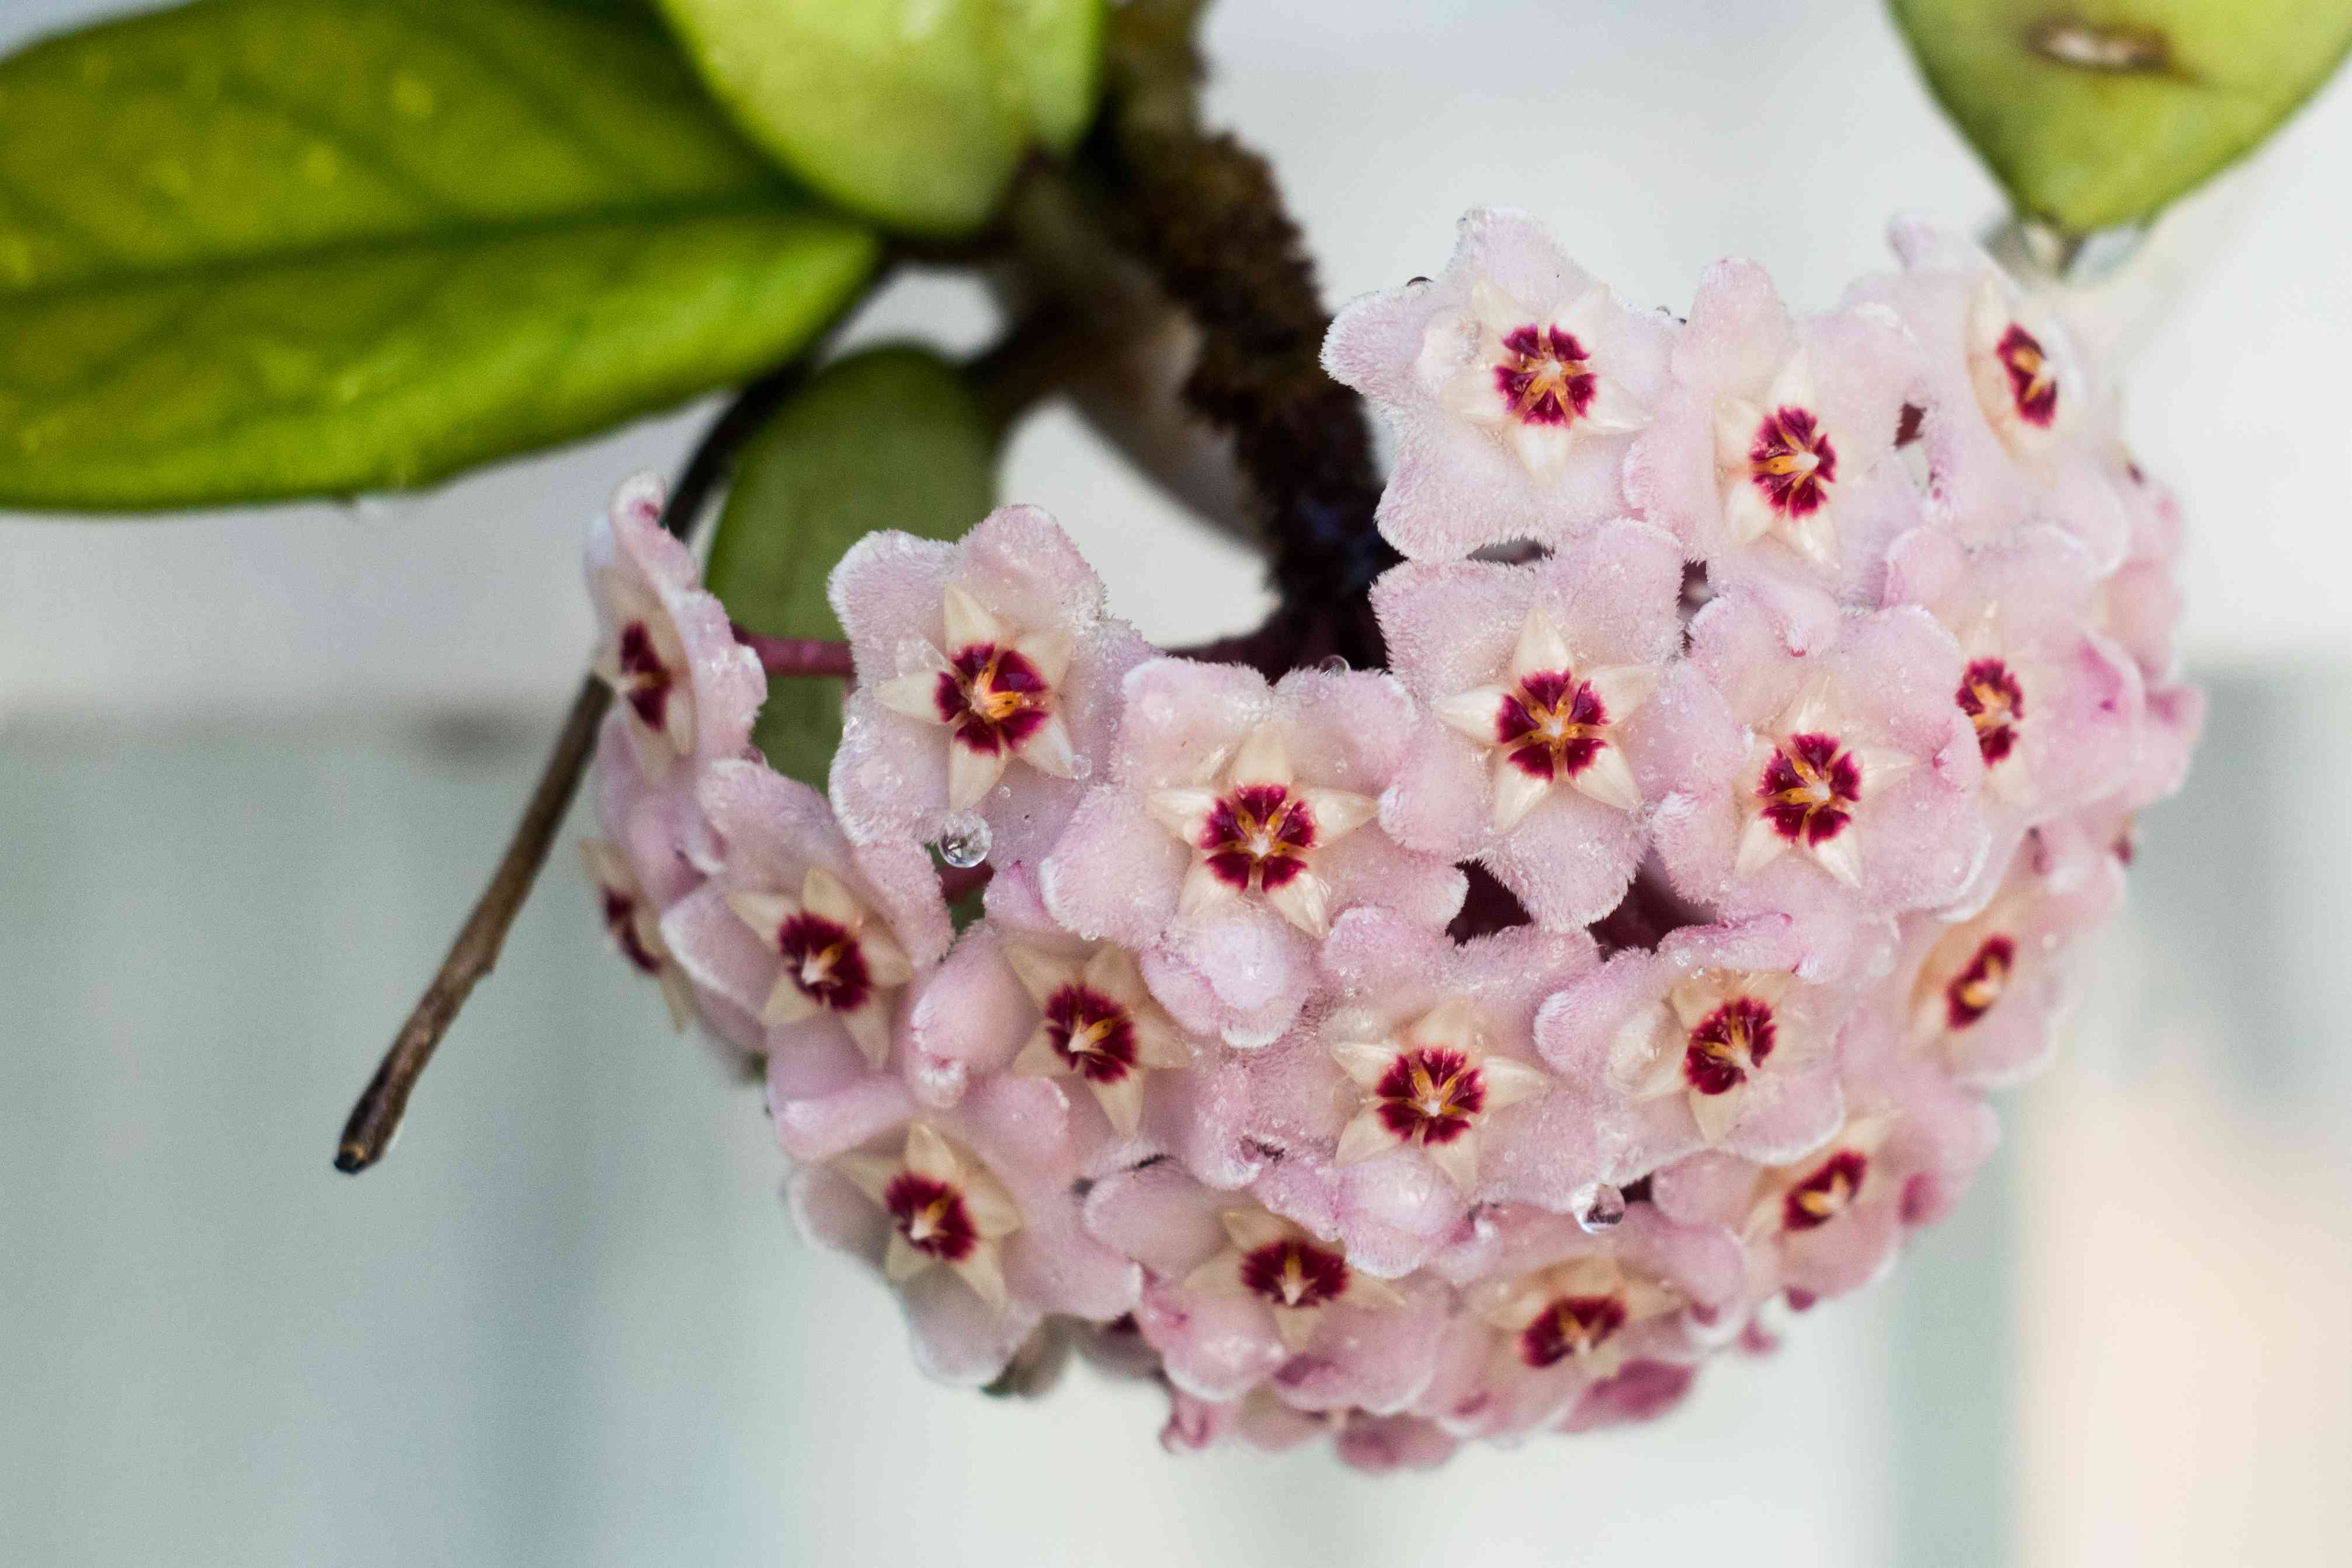 Hoya Carnosa or Waxplant Flower